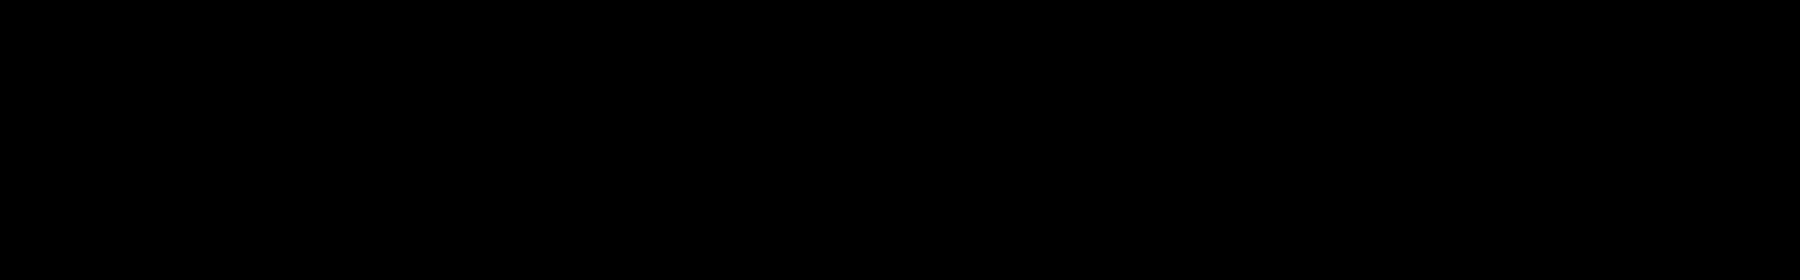 DARK DRILL - DRILL FIRE audio waveform